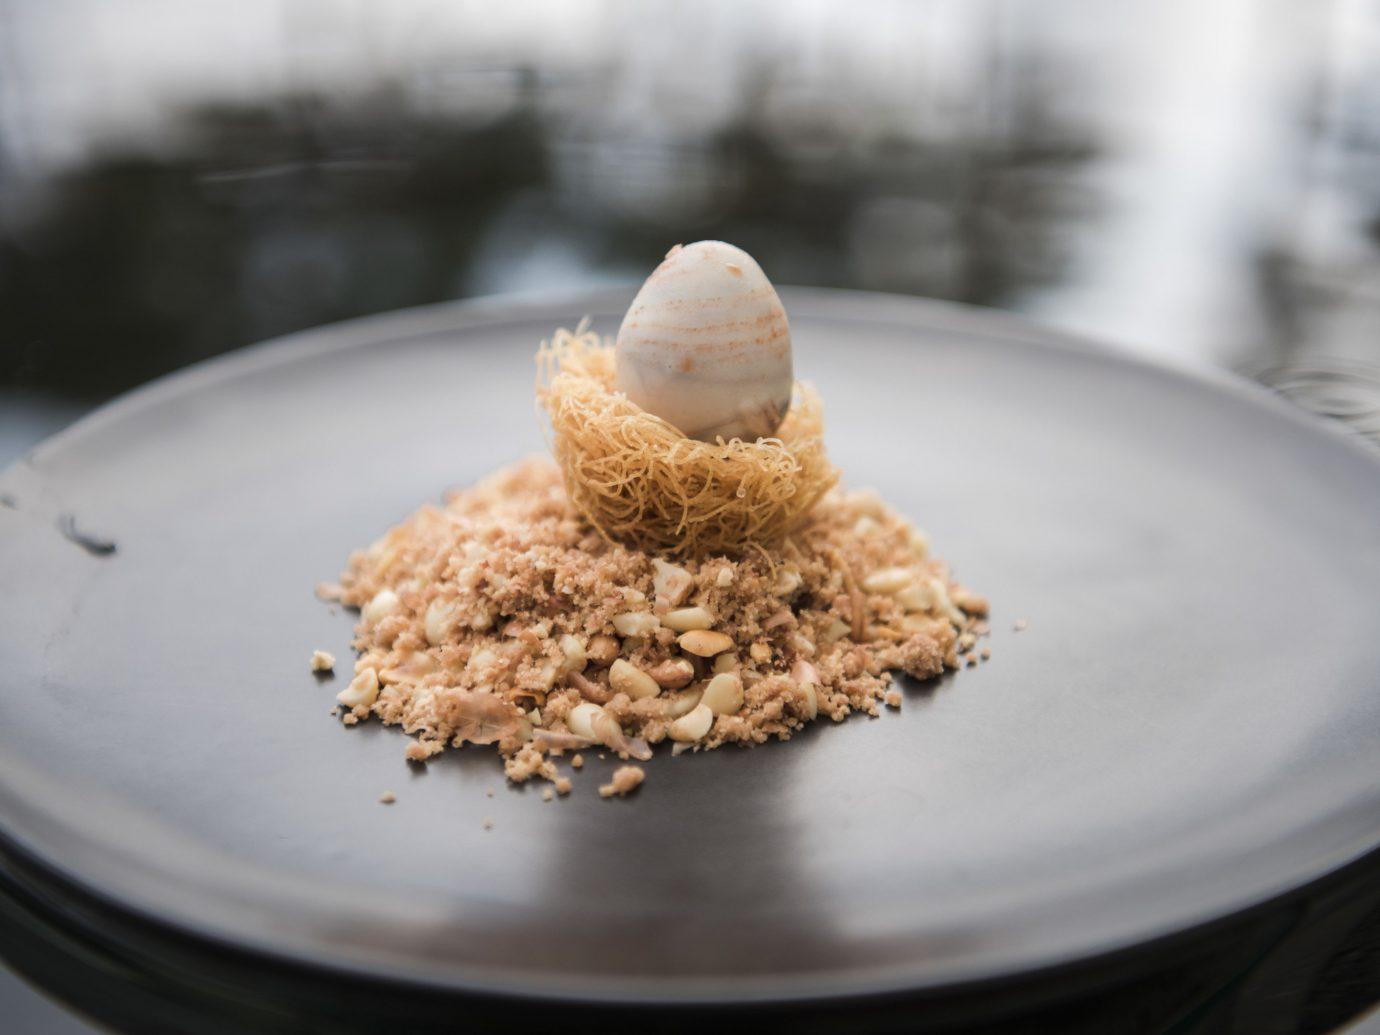 Hotels plate table dish white food meal coconut breakfast cuisine produce baking flavor dessert eaten